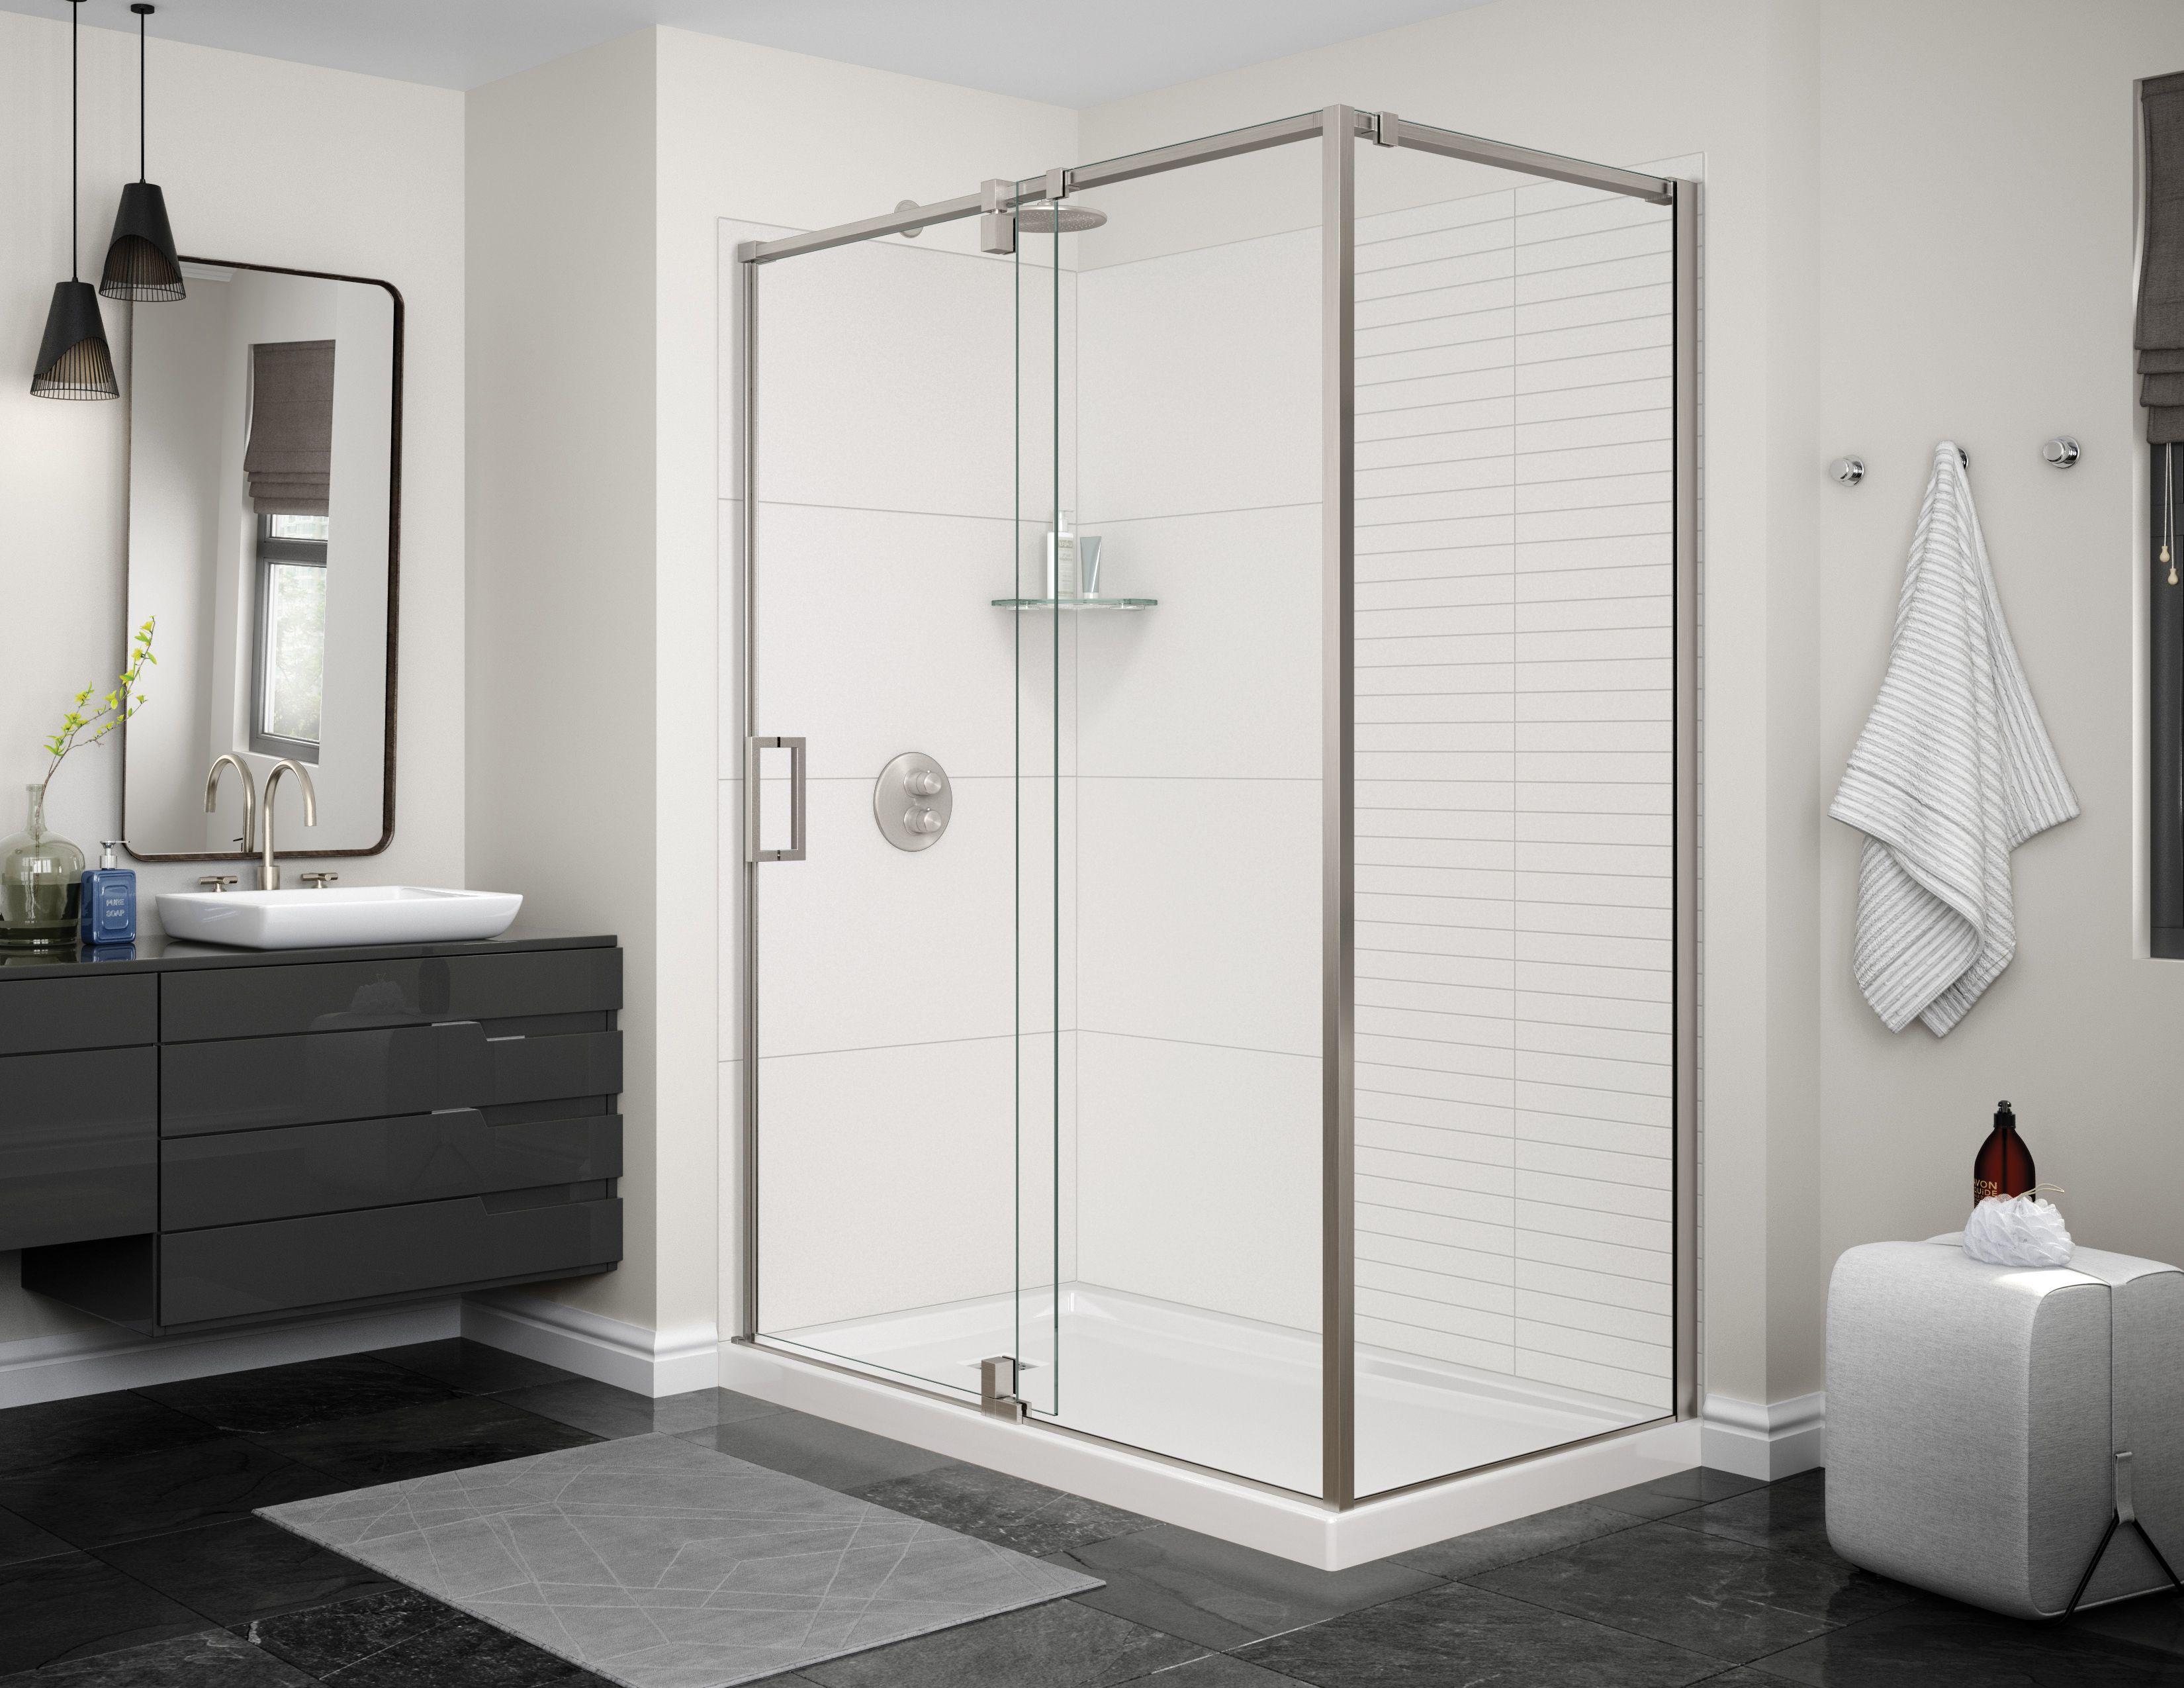 Utile by MAAX Bora White #maax #utile #shower #whitebathroom | Salle ...